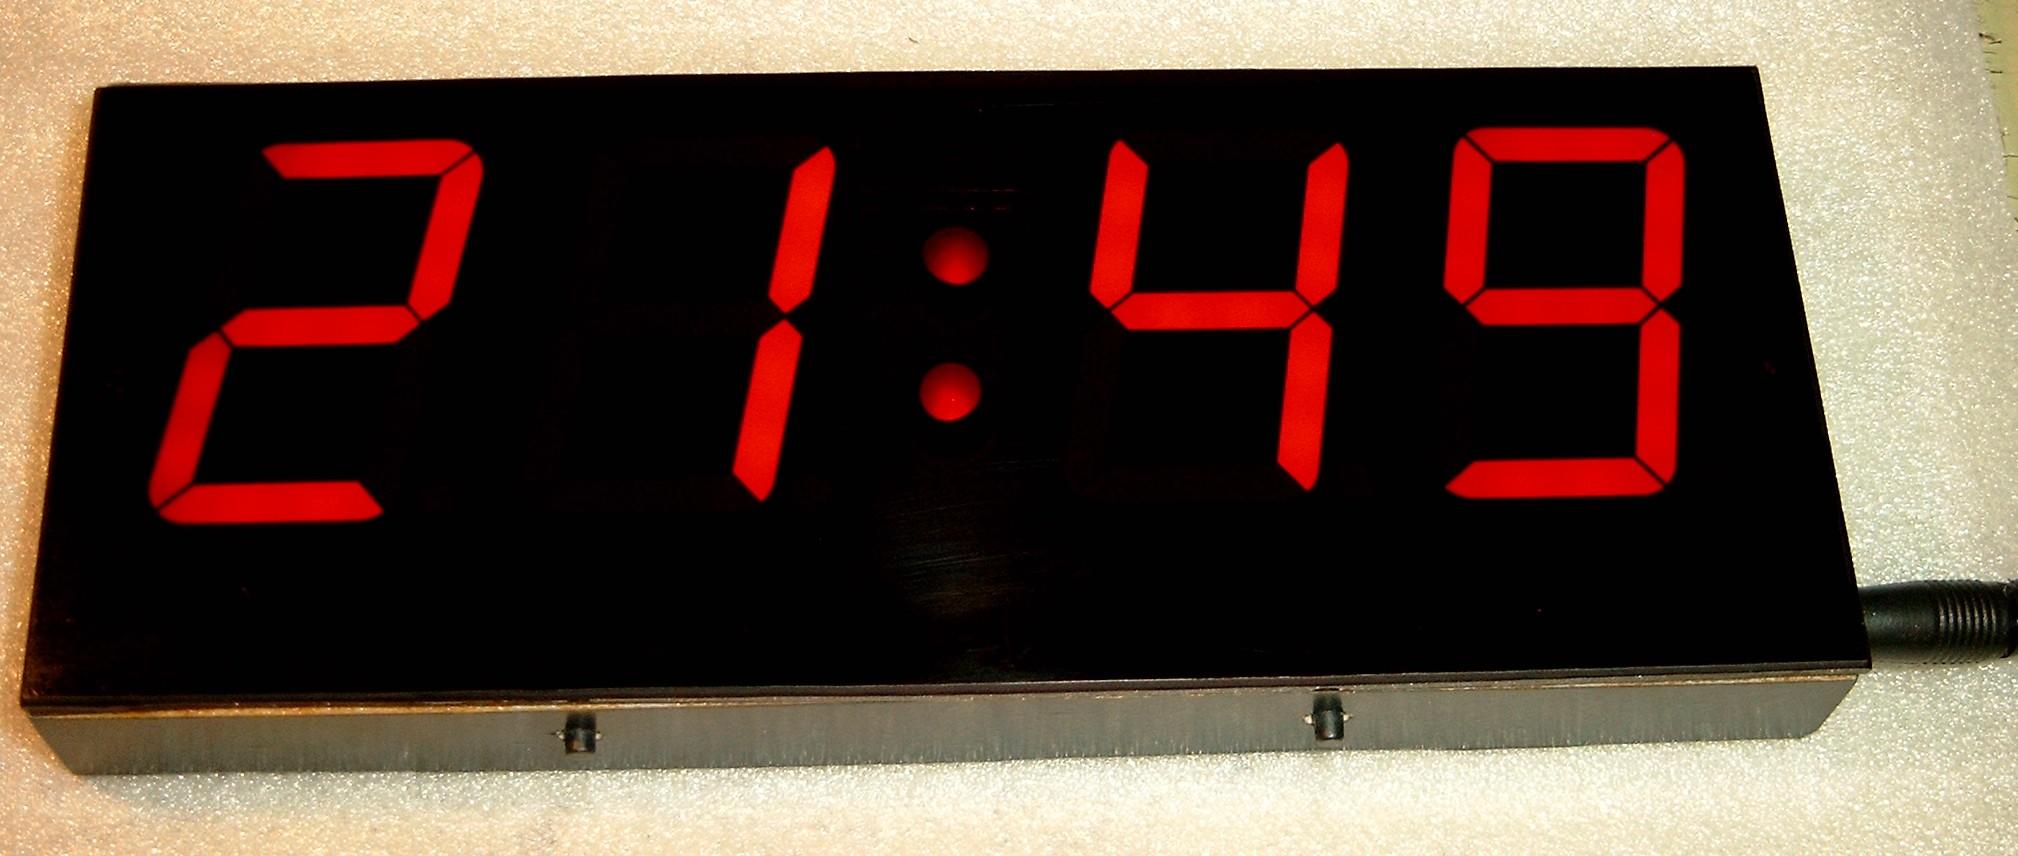 Kolejny Zegarek Led Na Atmega8 Ale Dokładny Elektrodapl